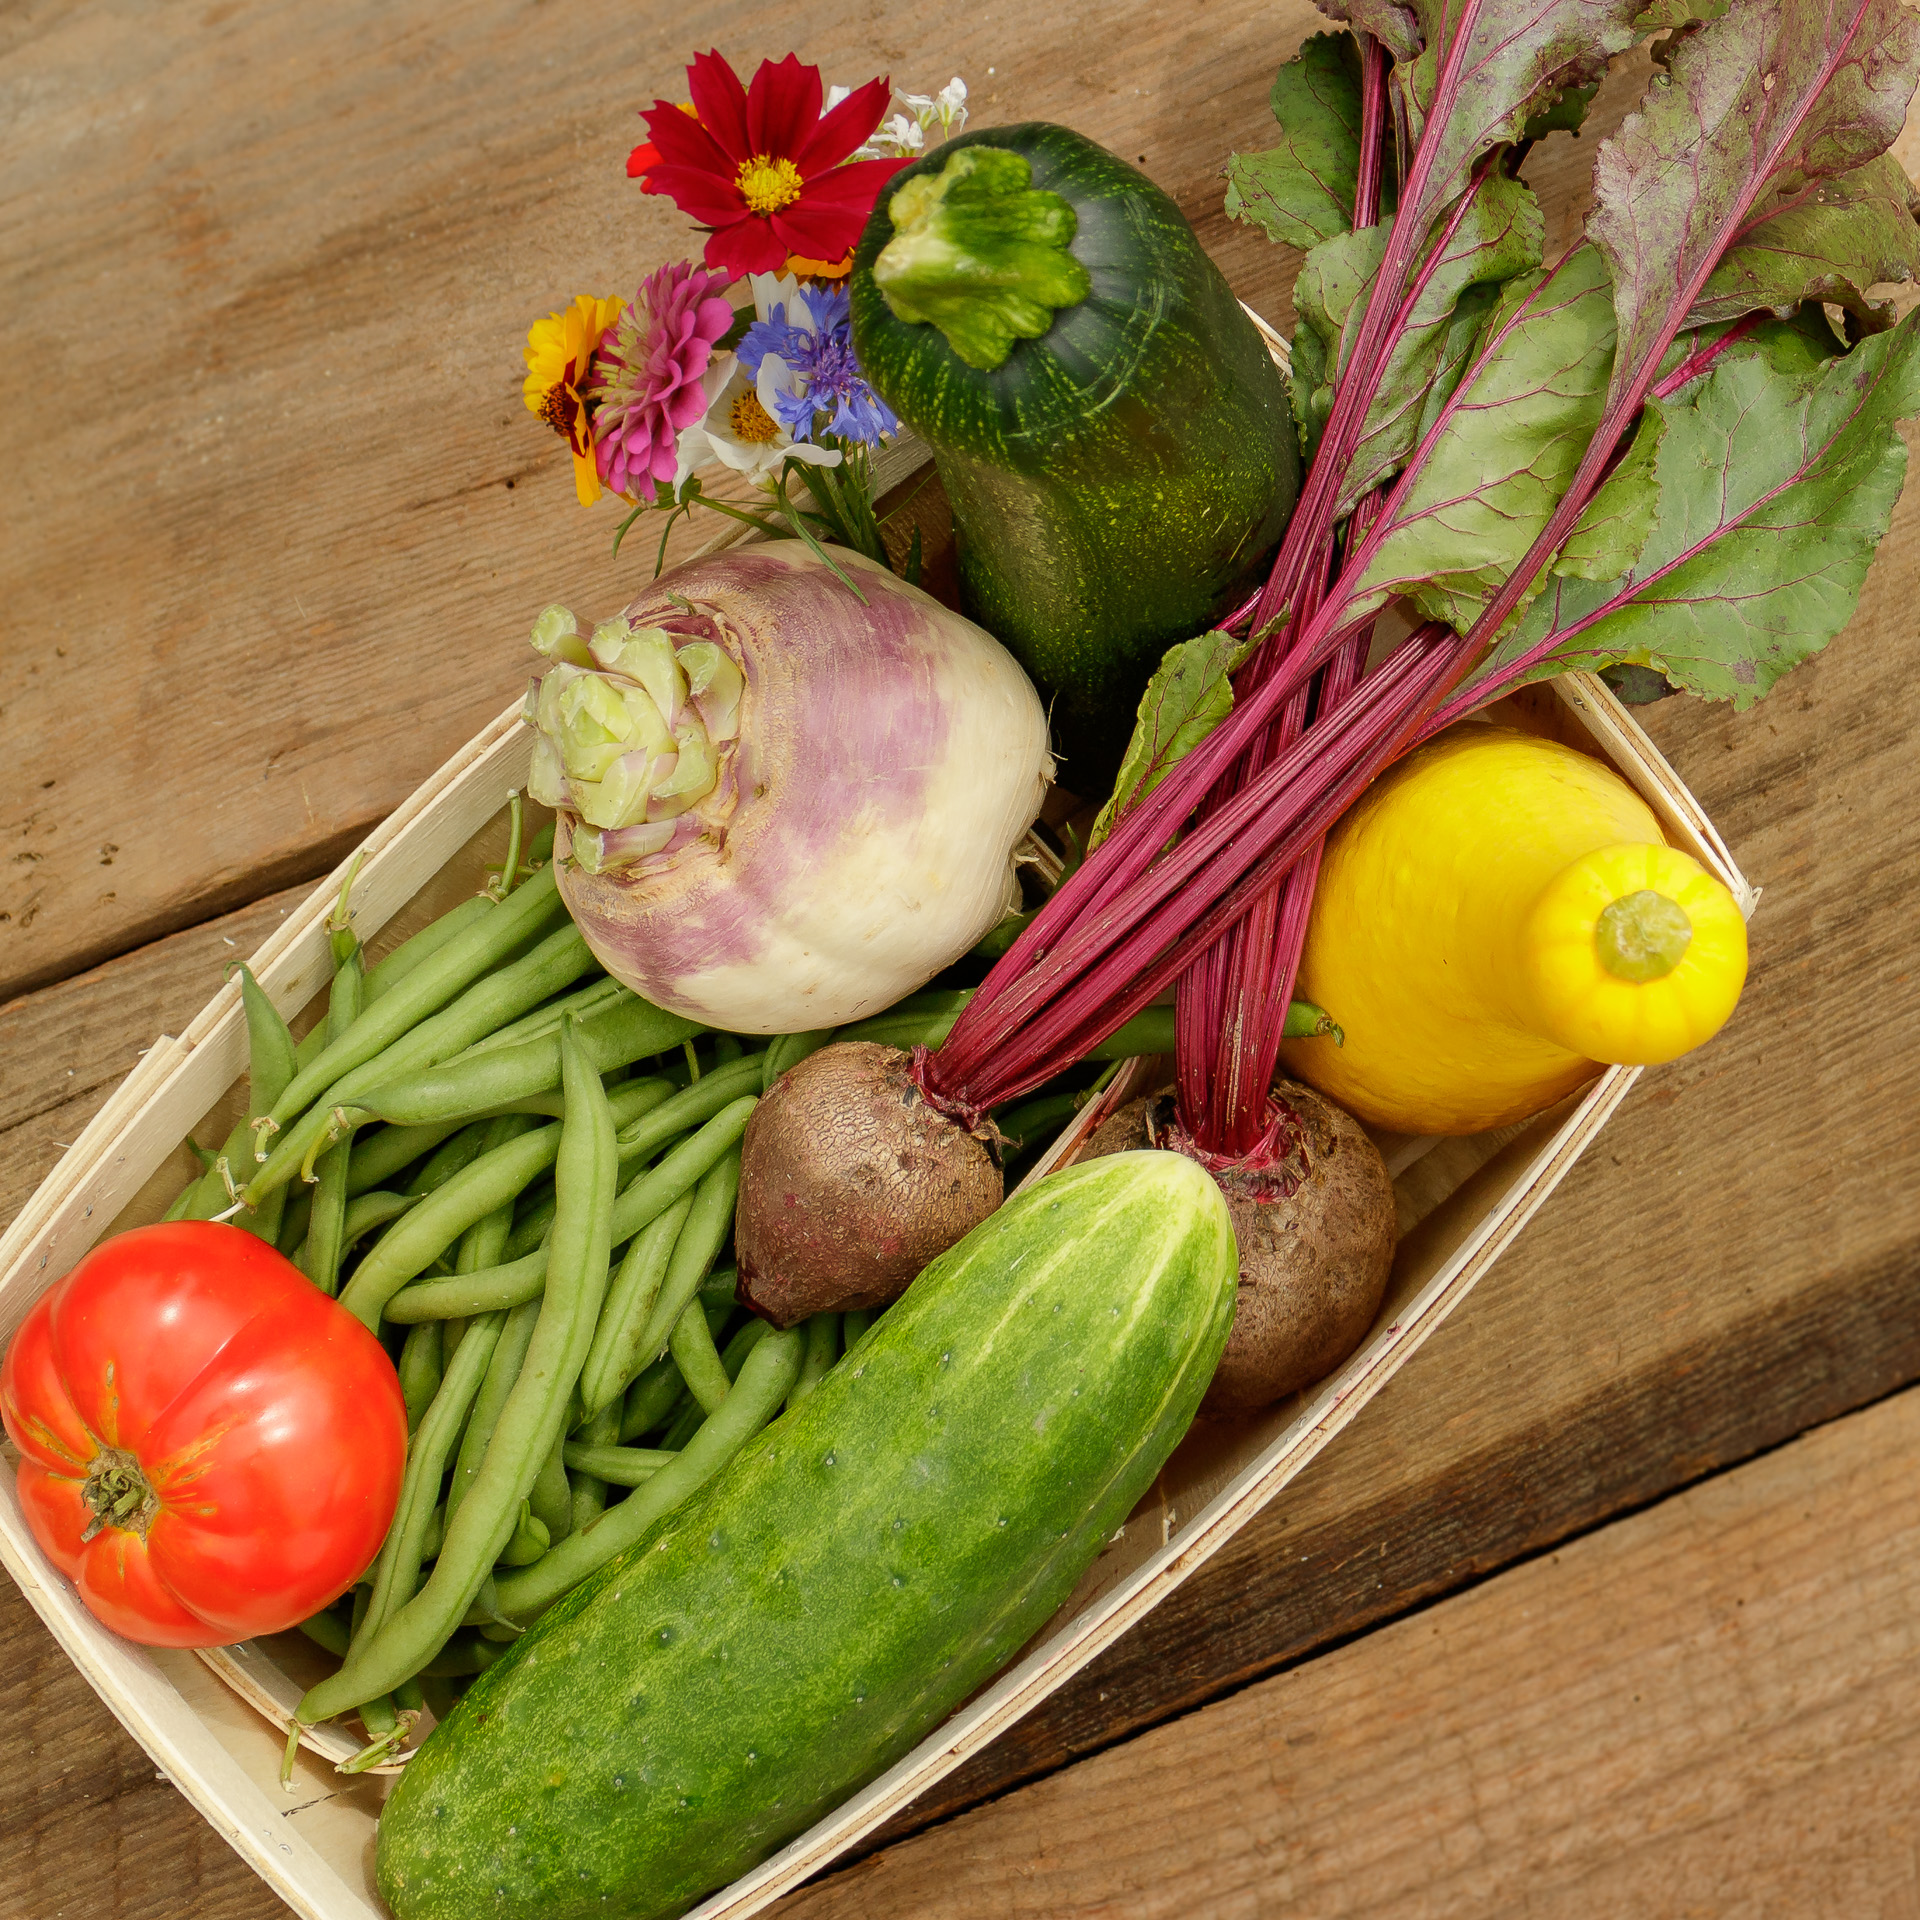 Produce Baskets Available at The FARM